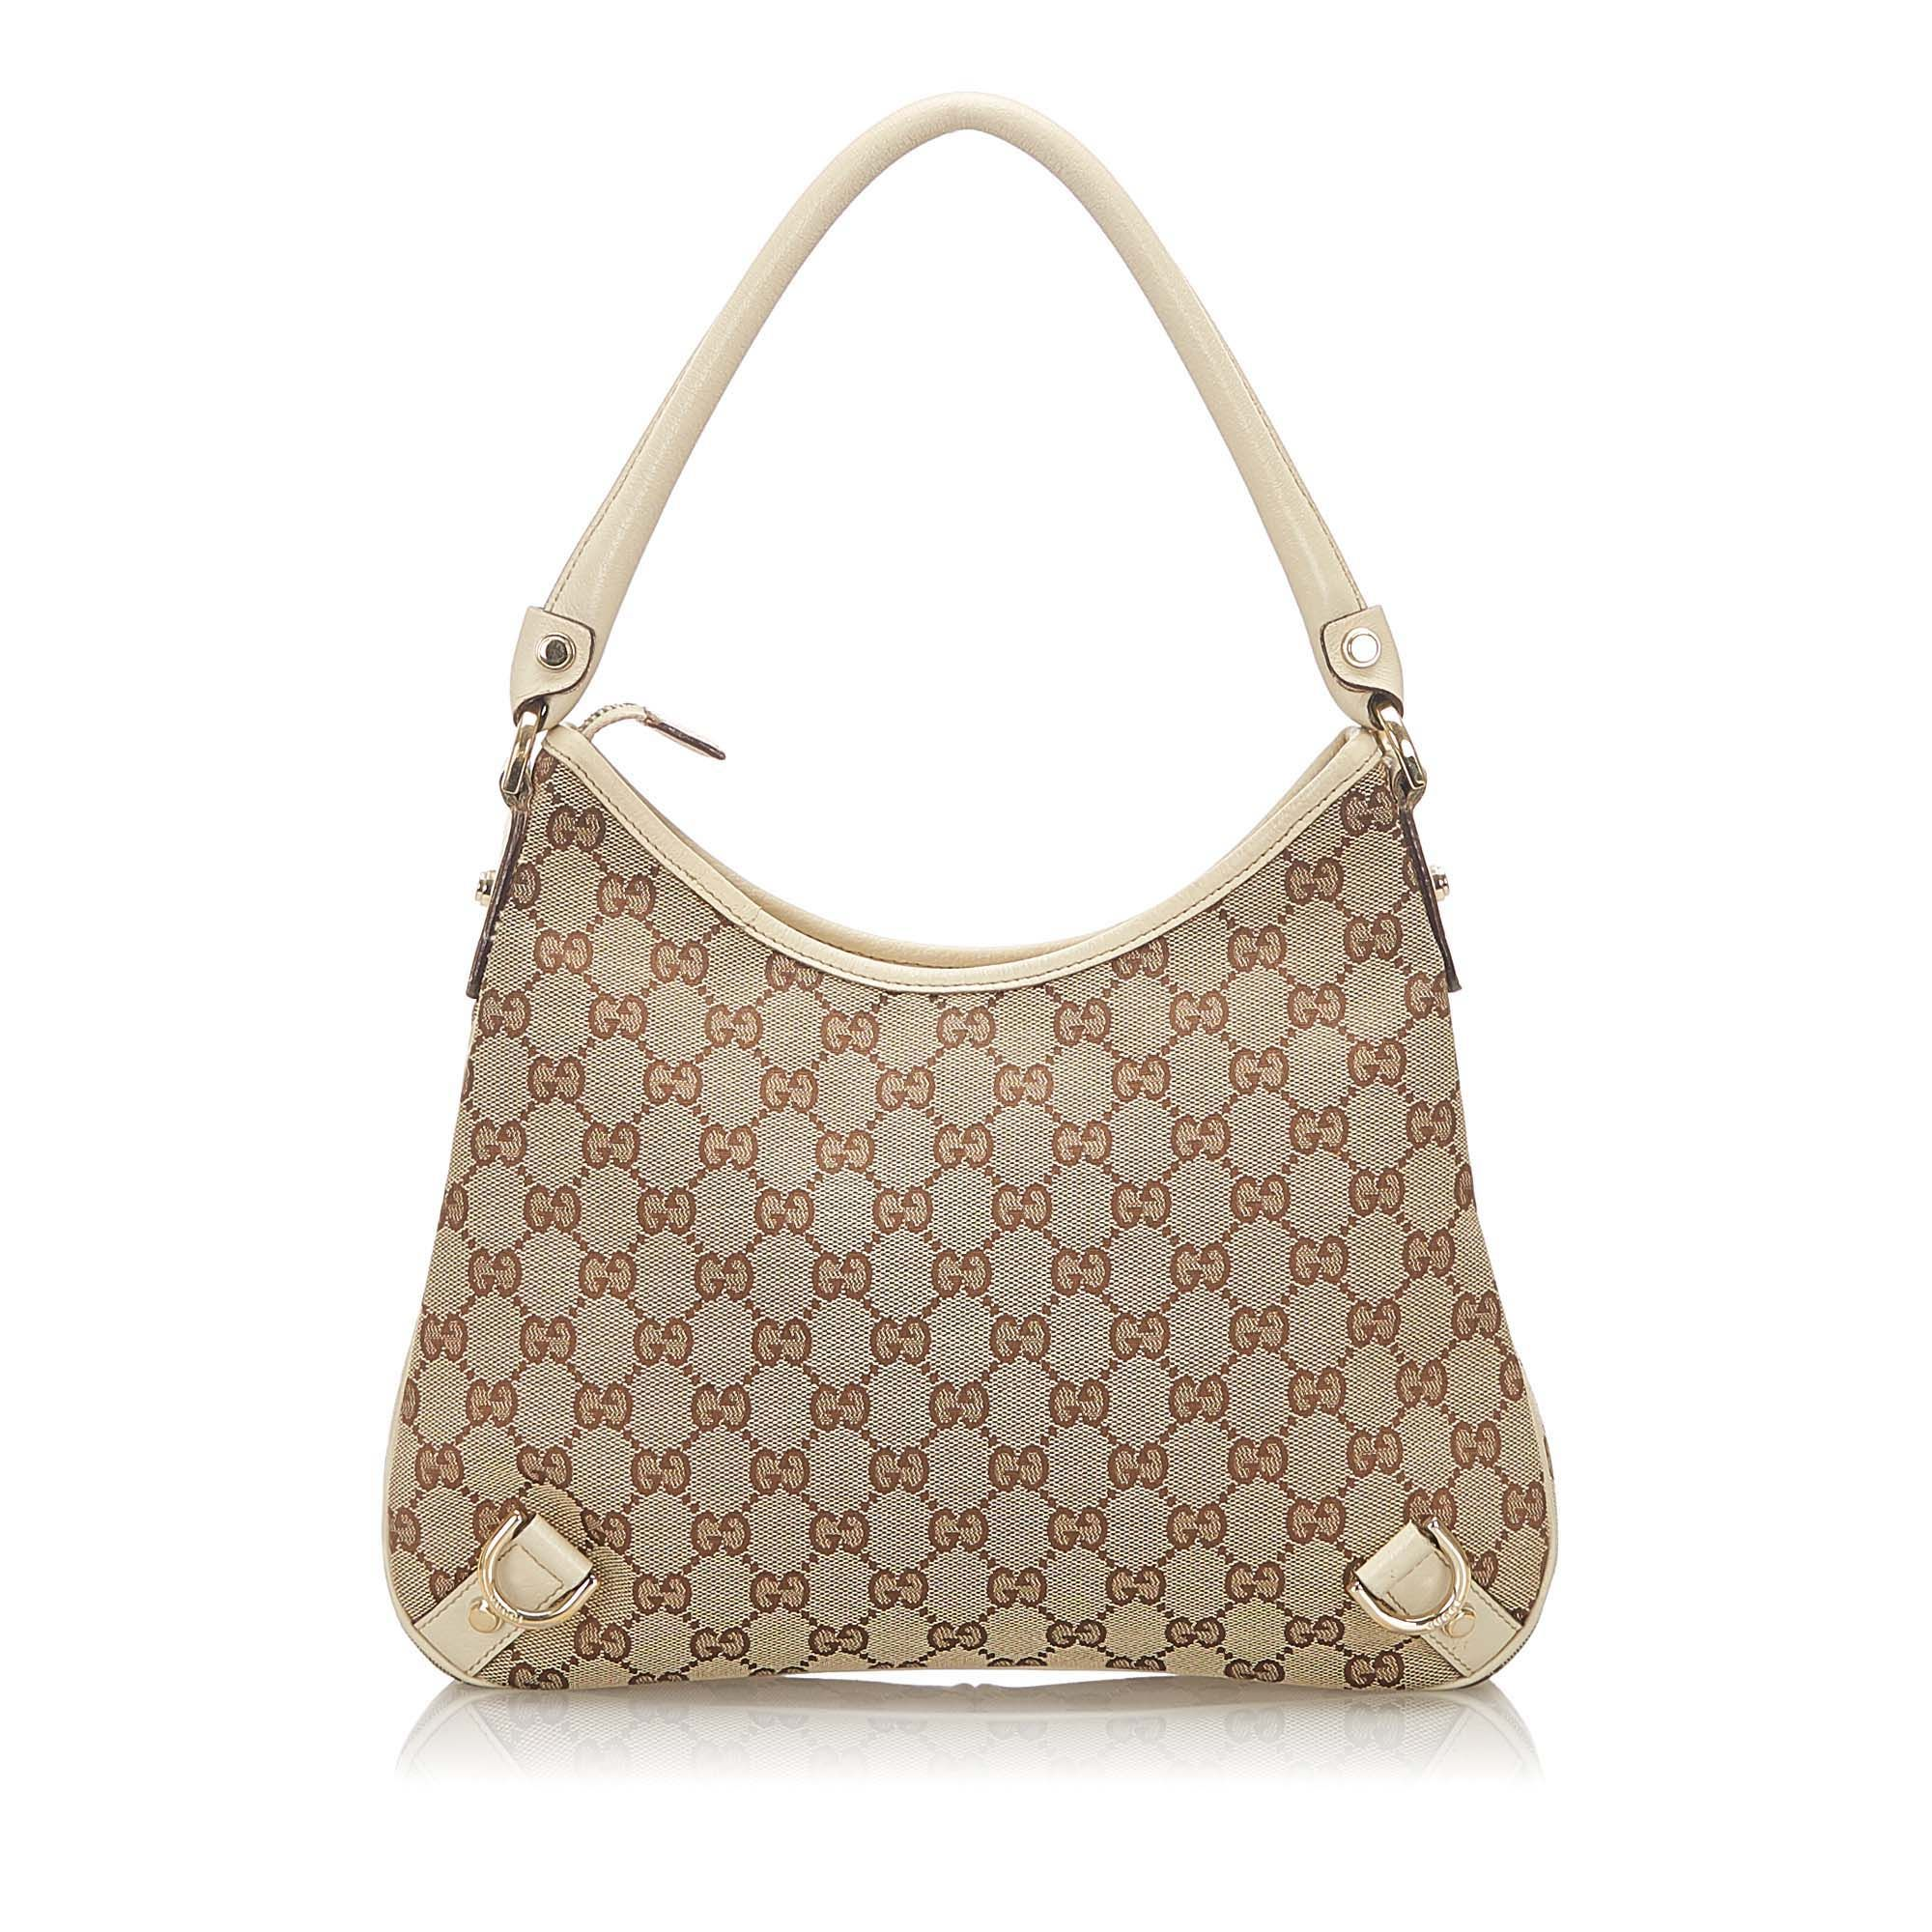 Vintage Gucci Abbey GG Canvas Shoulder Bag Brown